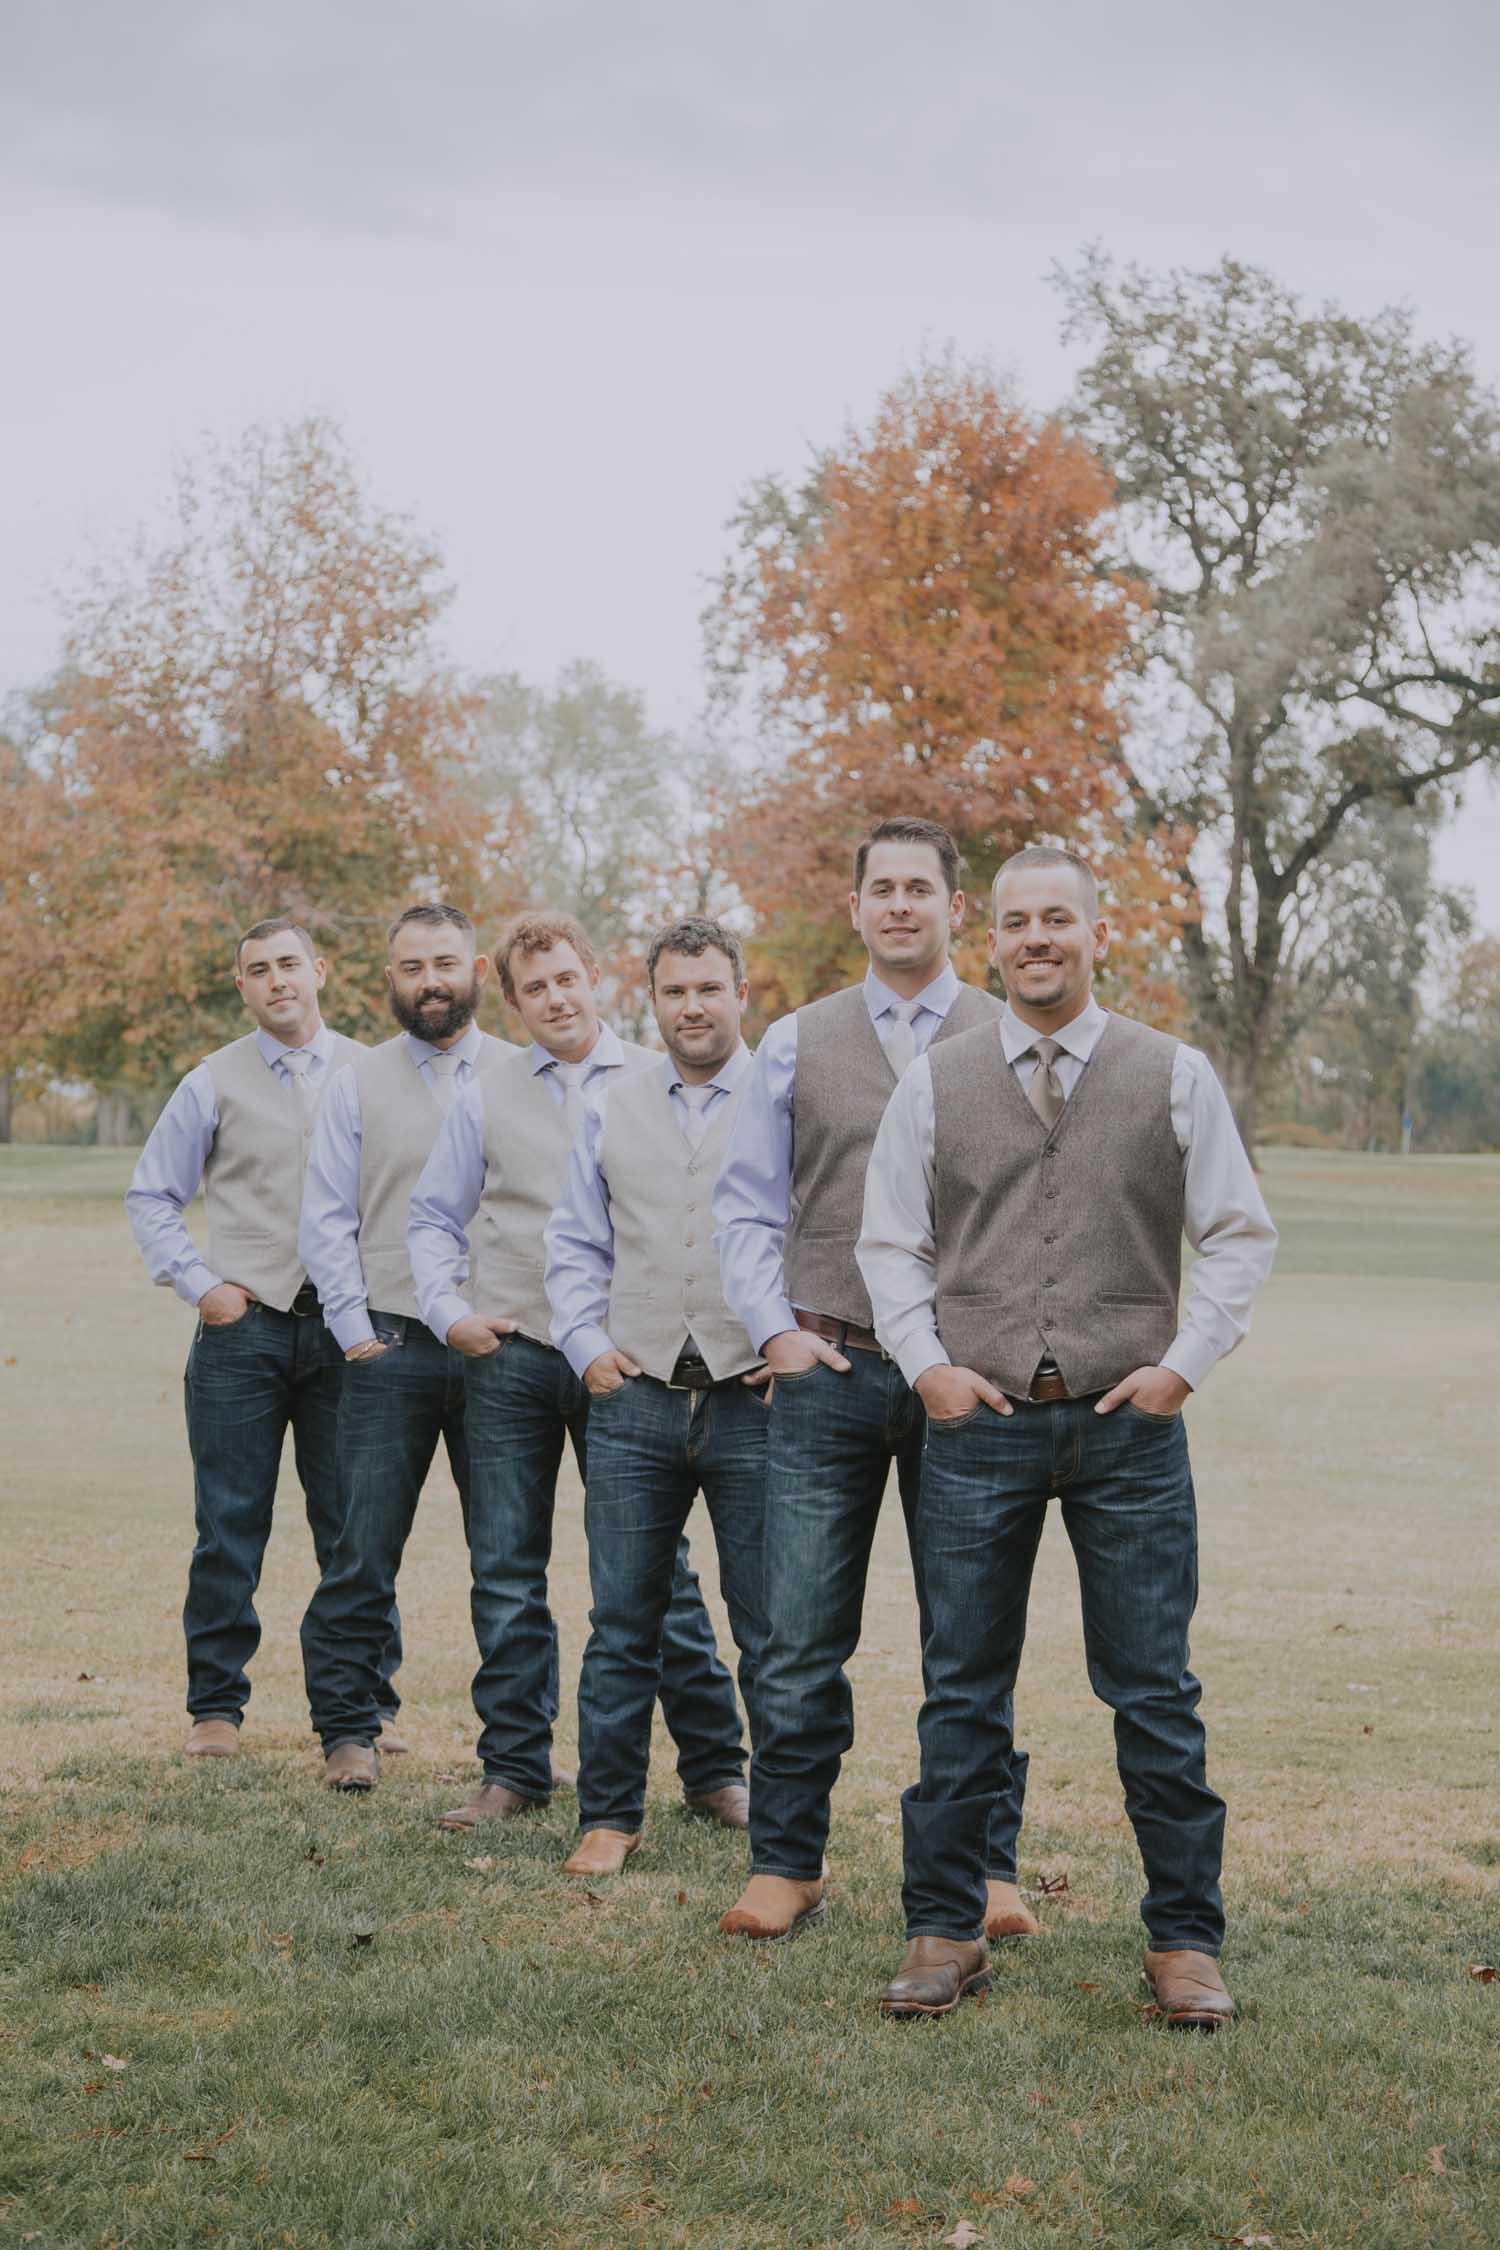 Bonnie-Scott-Rustic-Wedding-Chico-Ca-Butte-Creek-Country-Club53.jpg